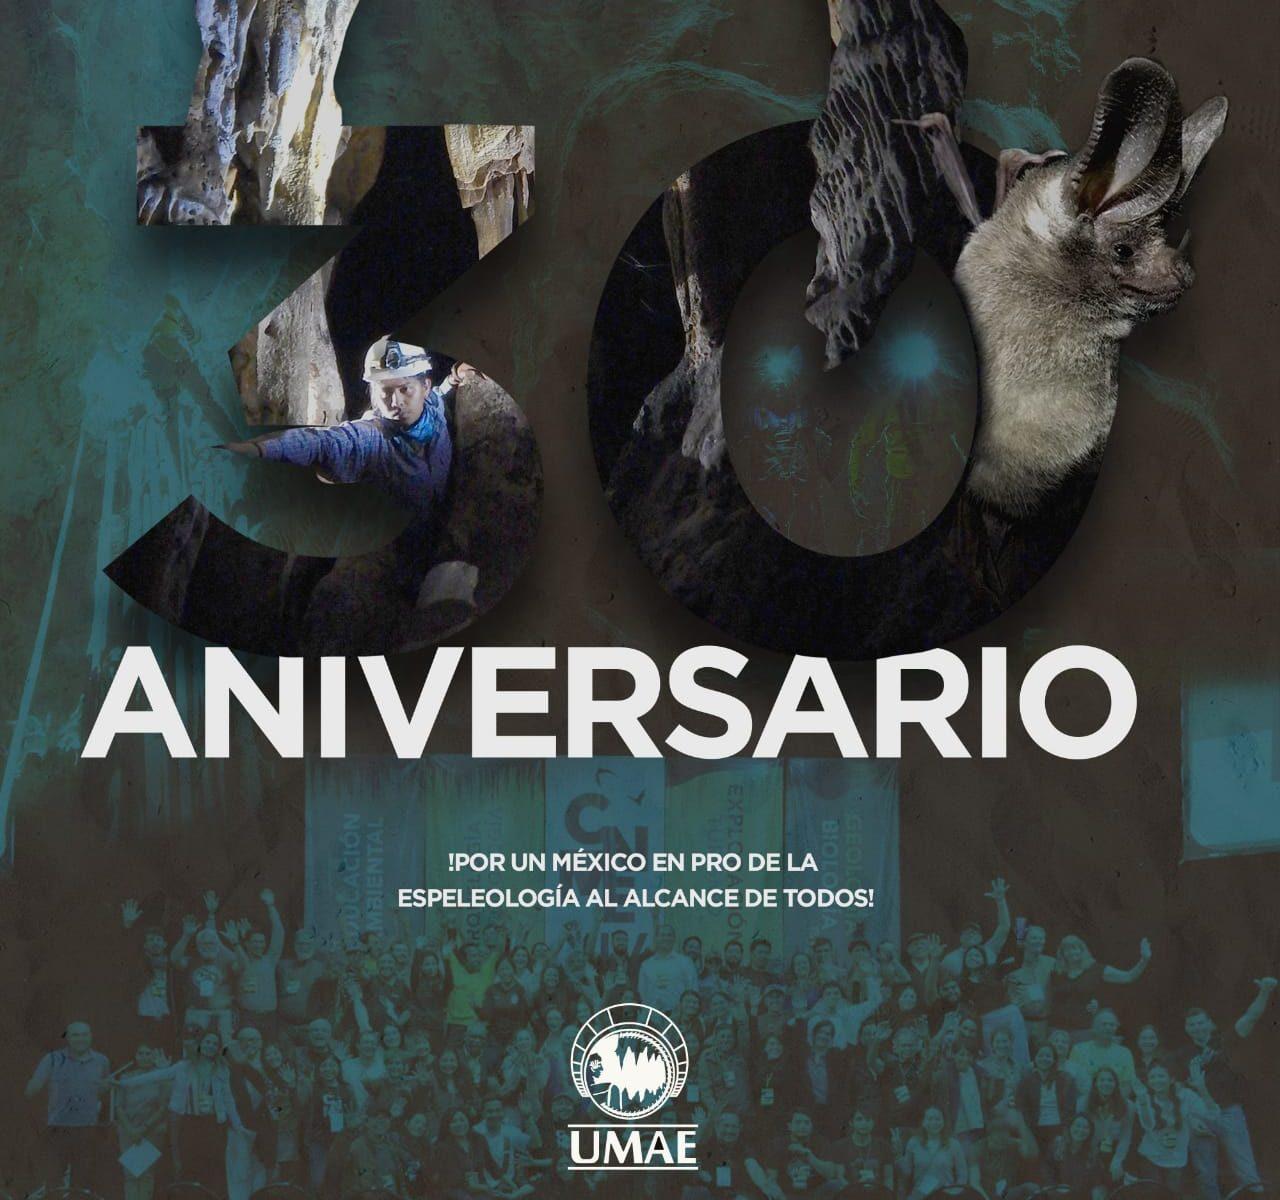 30 aniversario de la UMAE